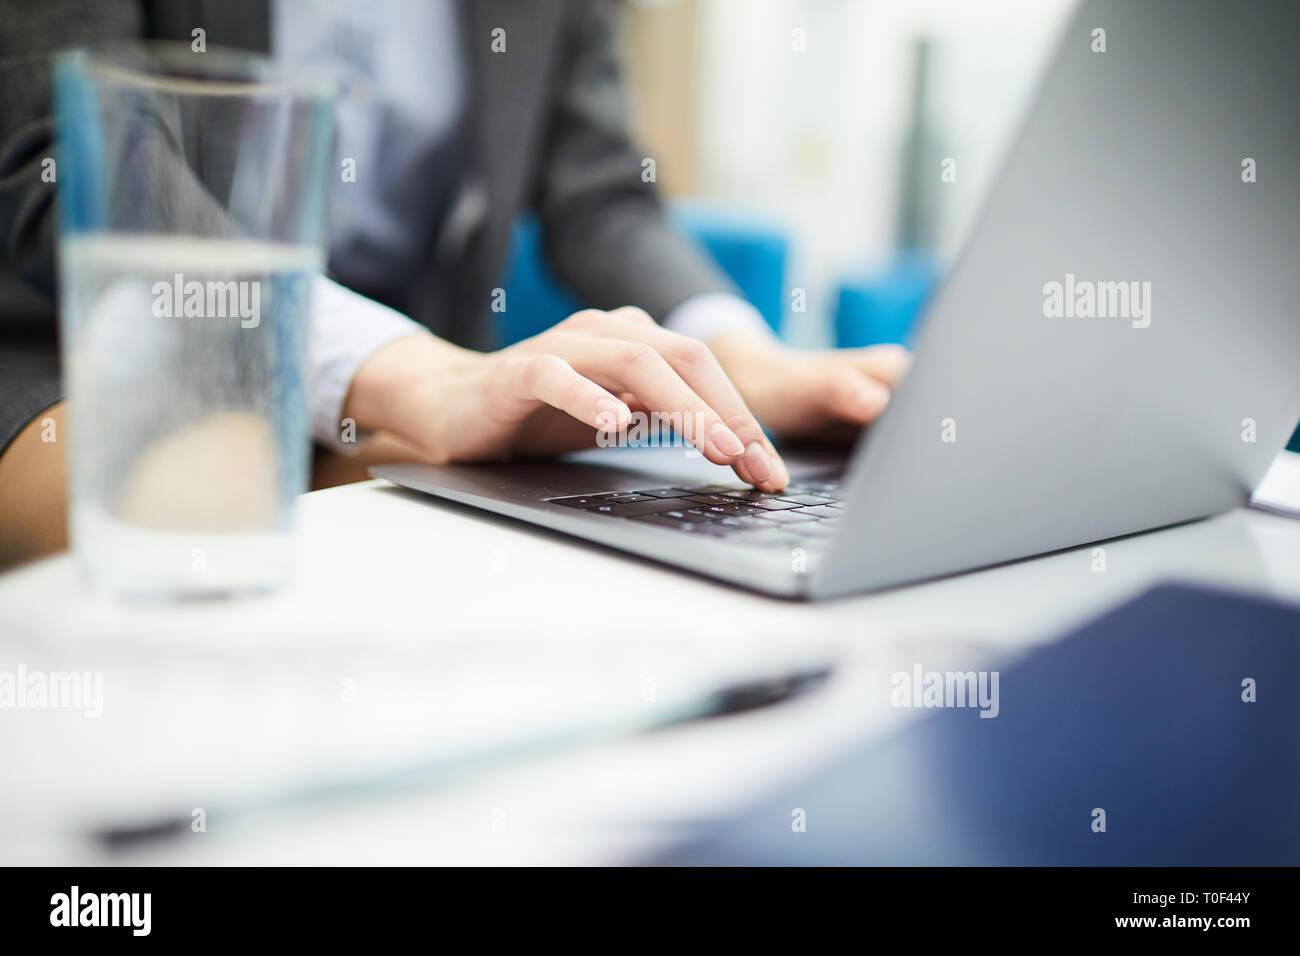 Imprenditrice digitando Closeup Foto Stock